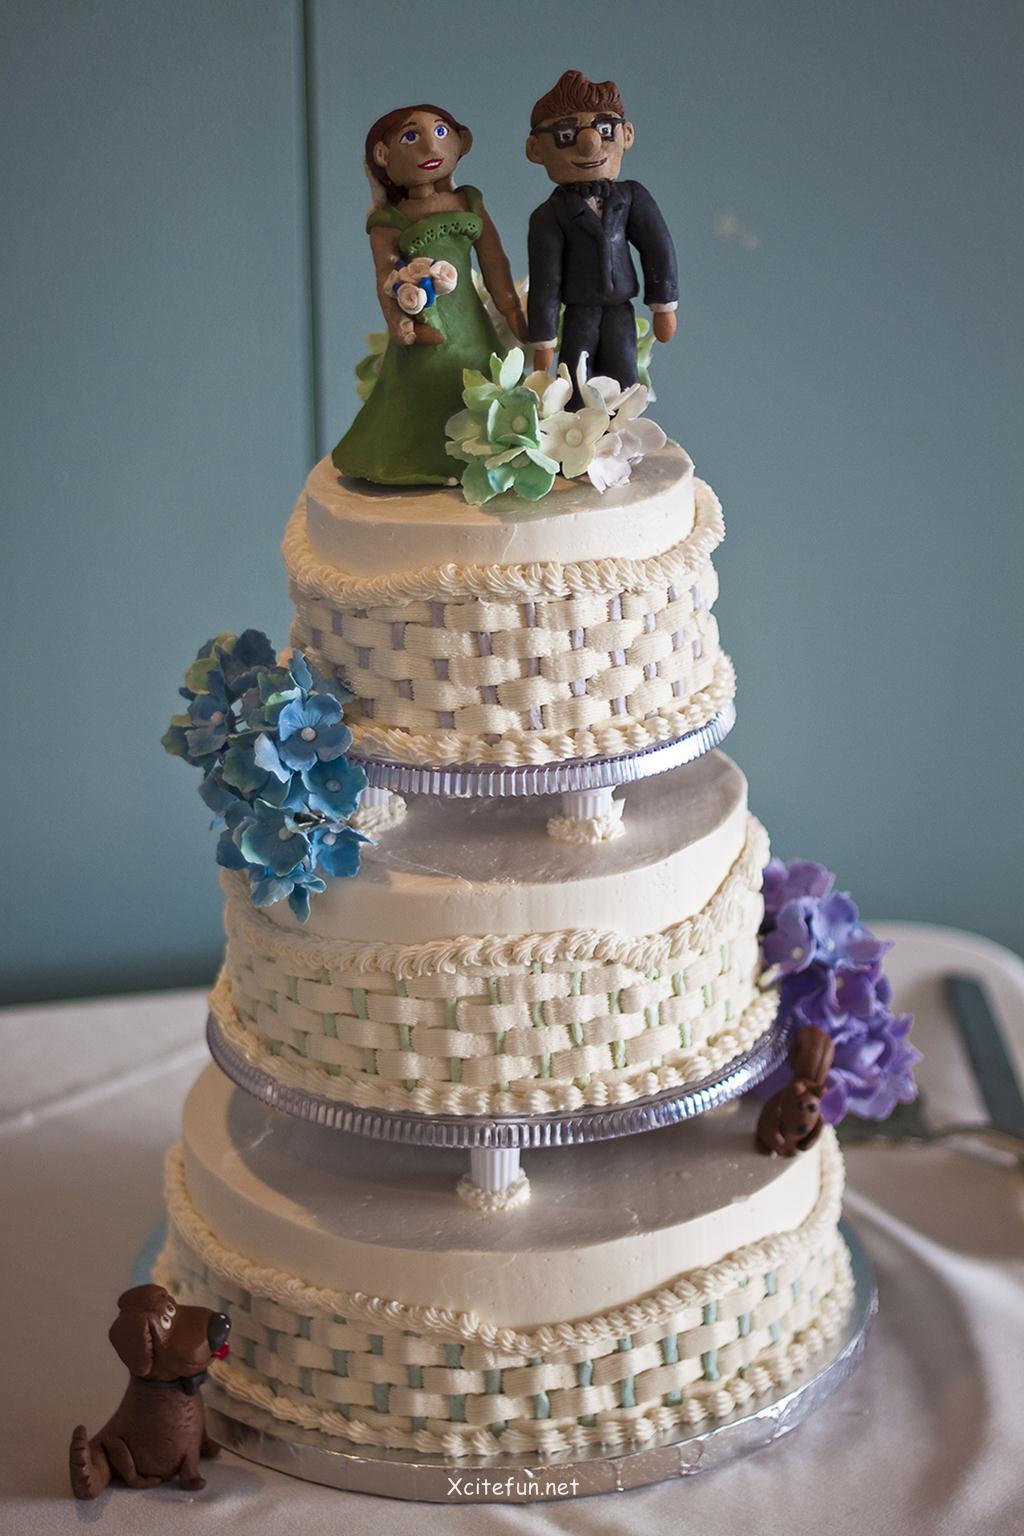 Wedding Cakes Decorations  Wedding Cakes Decorating Ideas XciteFun